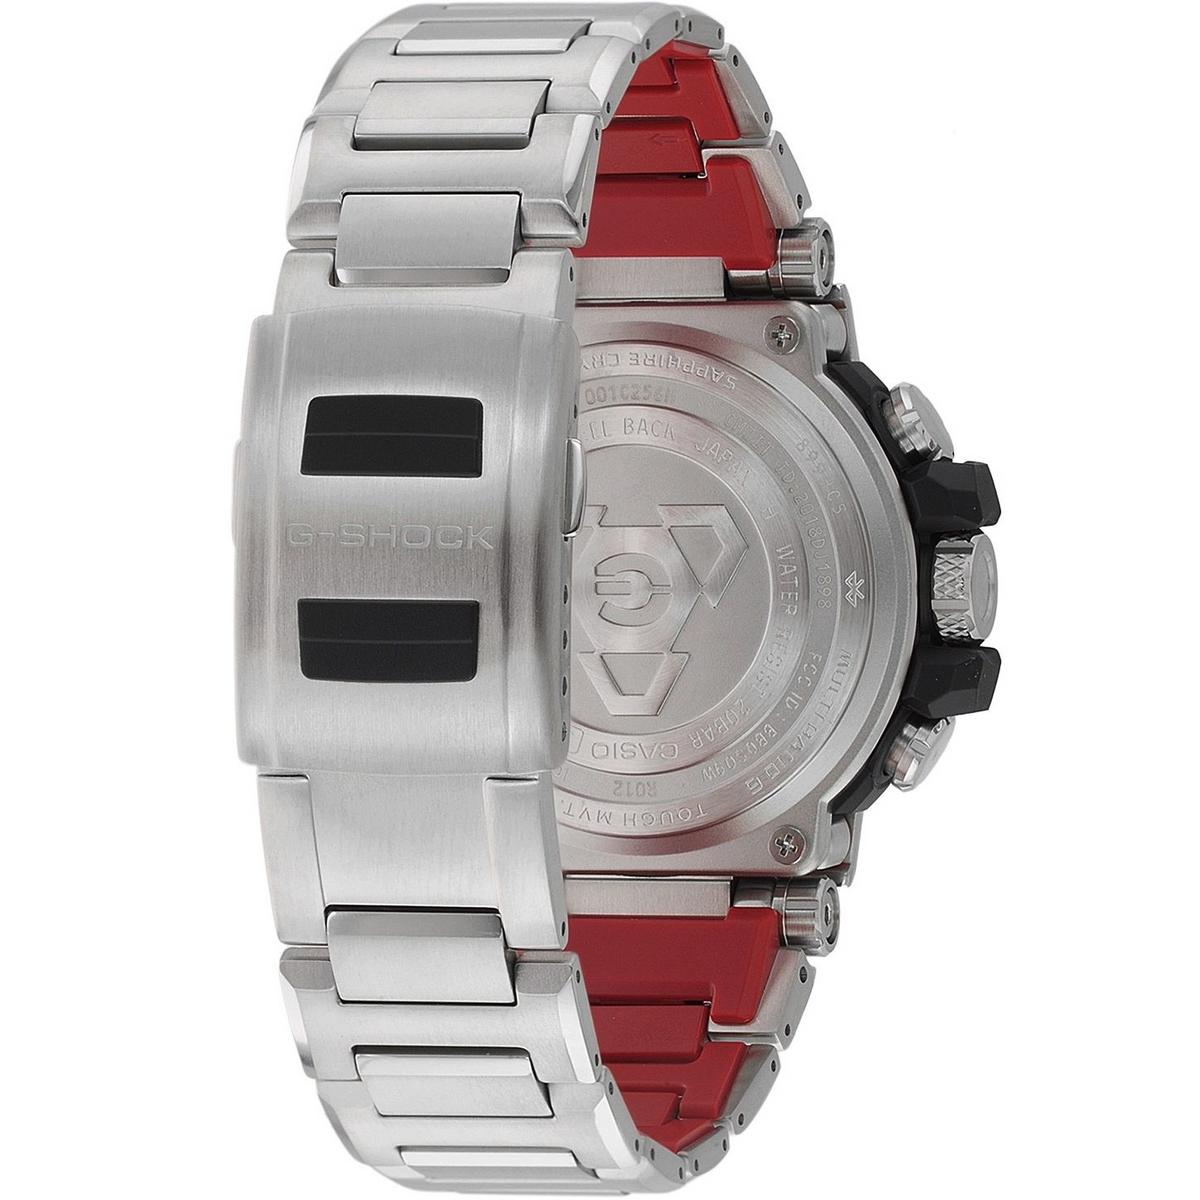 G Shock Zwart Met Rood.Casio Metal Twisted G Shock Official Premium G Shock Dealer